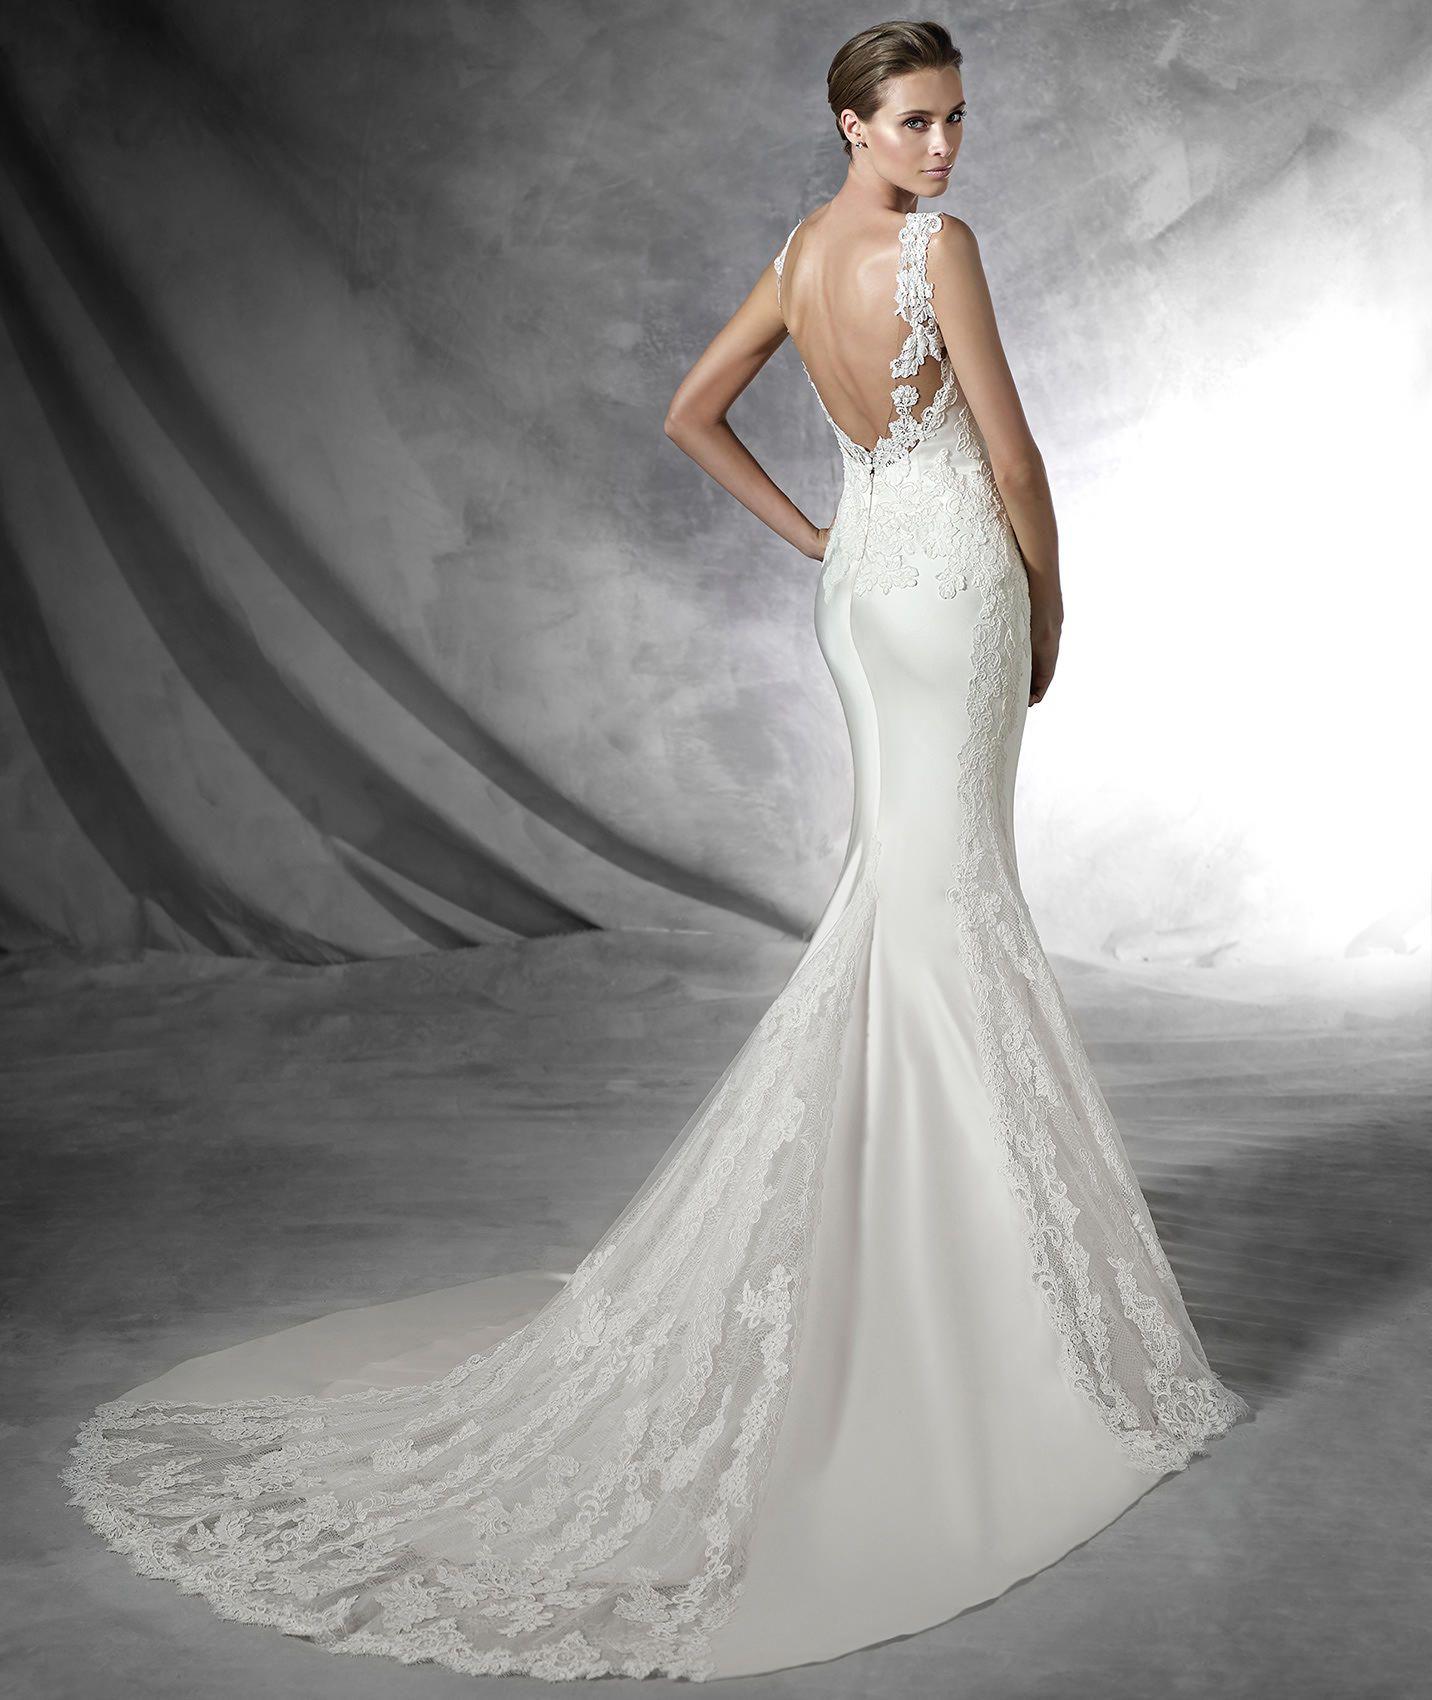 PRESEA Mermaid wedding dress with sweetheart neckline